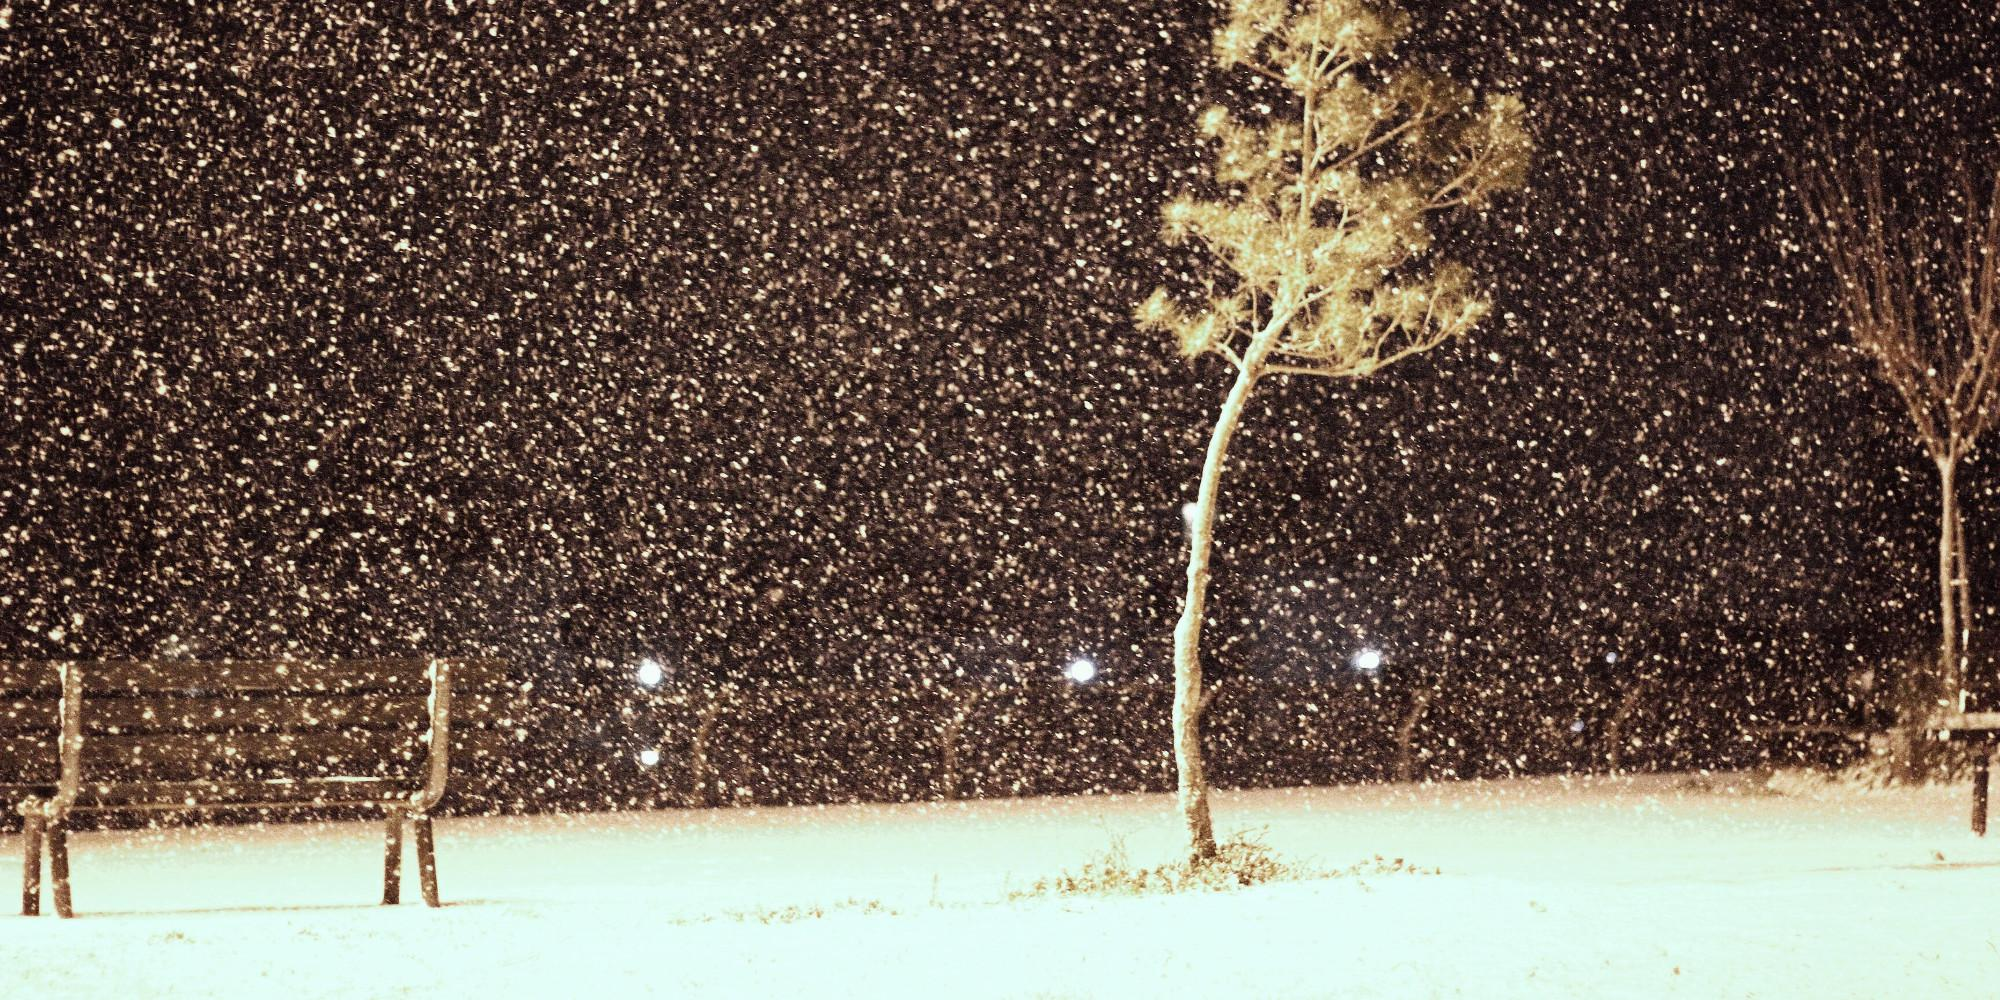 athina-xionia-1000 Στα «λευκά» ντύθηκε η Αθήνα – Συνεχίζεται και την Τρίτη η σφοδρή κακοκαιρία [εικόνες]